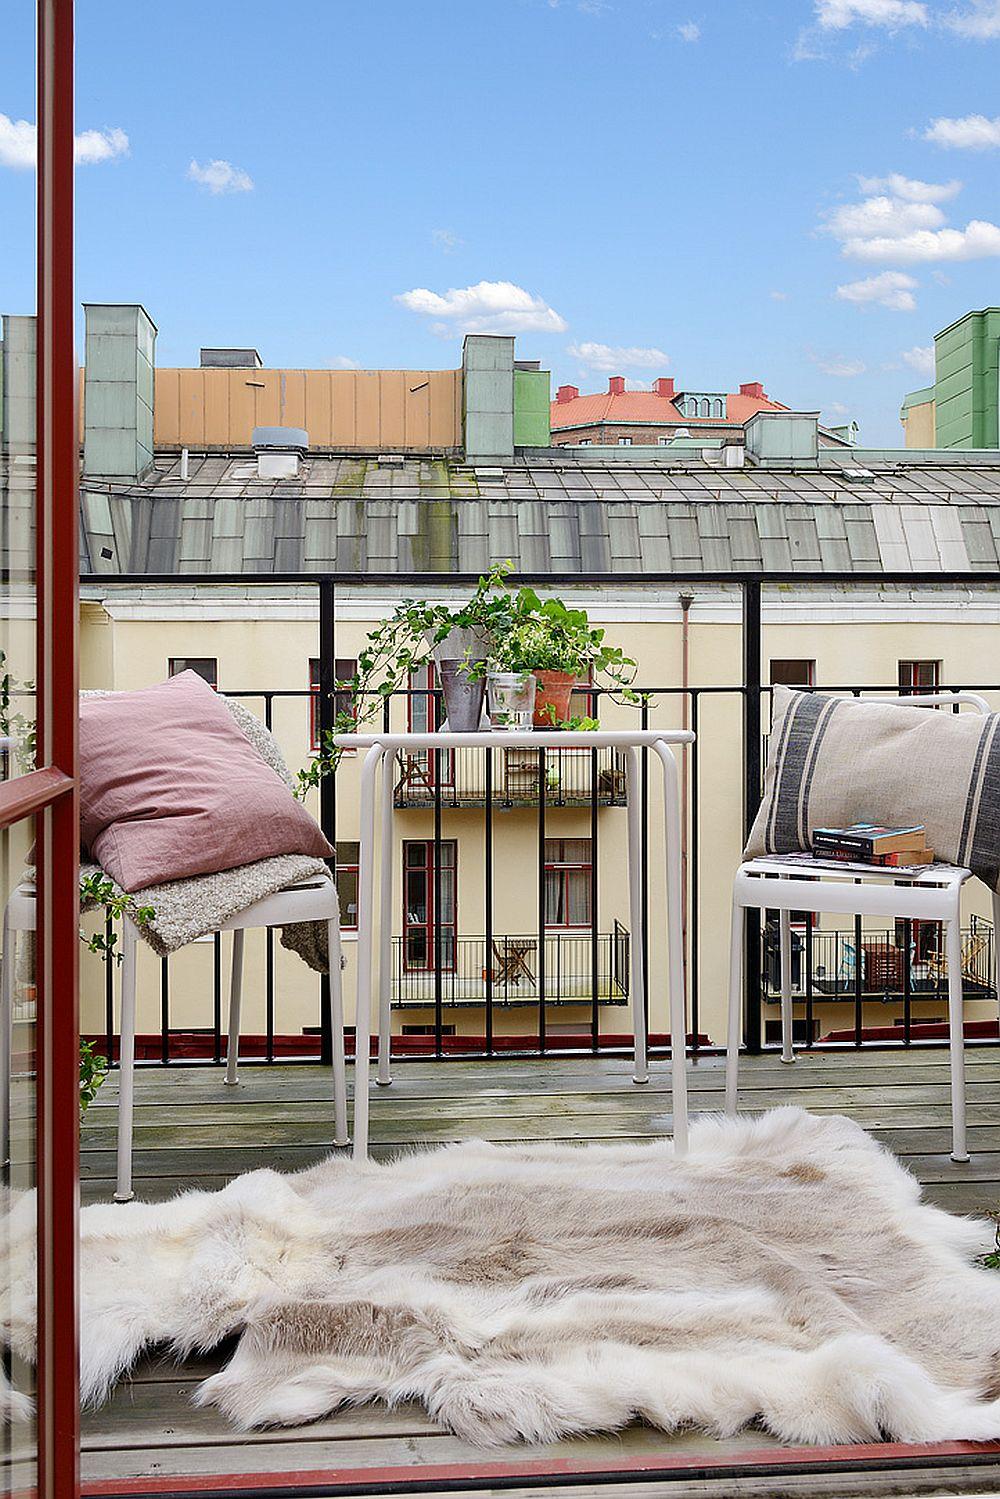 adelaparvu.com locuinta la mansarda, casa Suedia, Foto Alvhem Makleri (1)